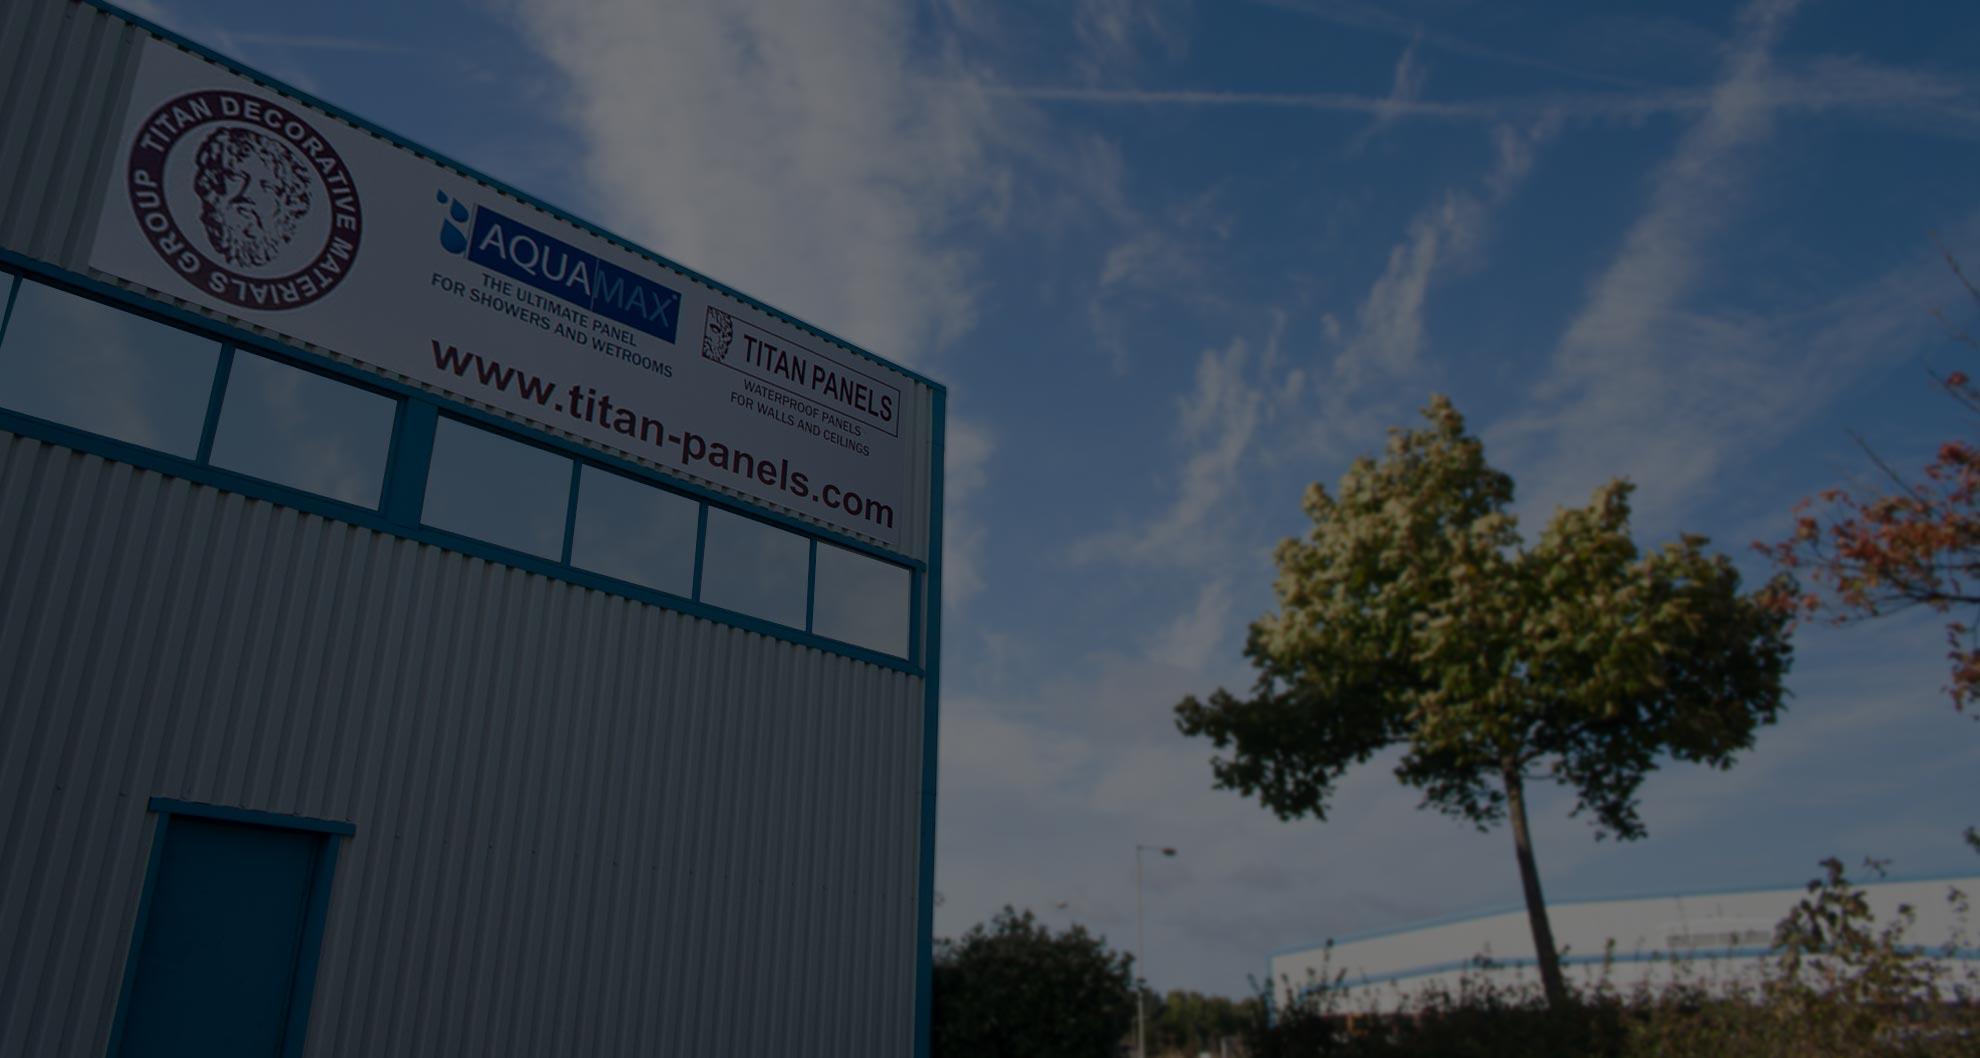 TITAN-Decorative-Materials-Group-Factory-Corner-Windows - TITAN Panels